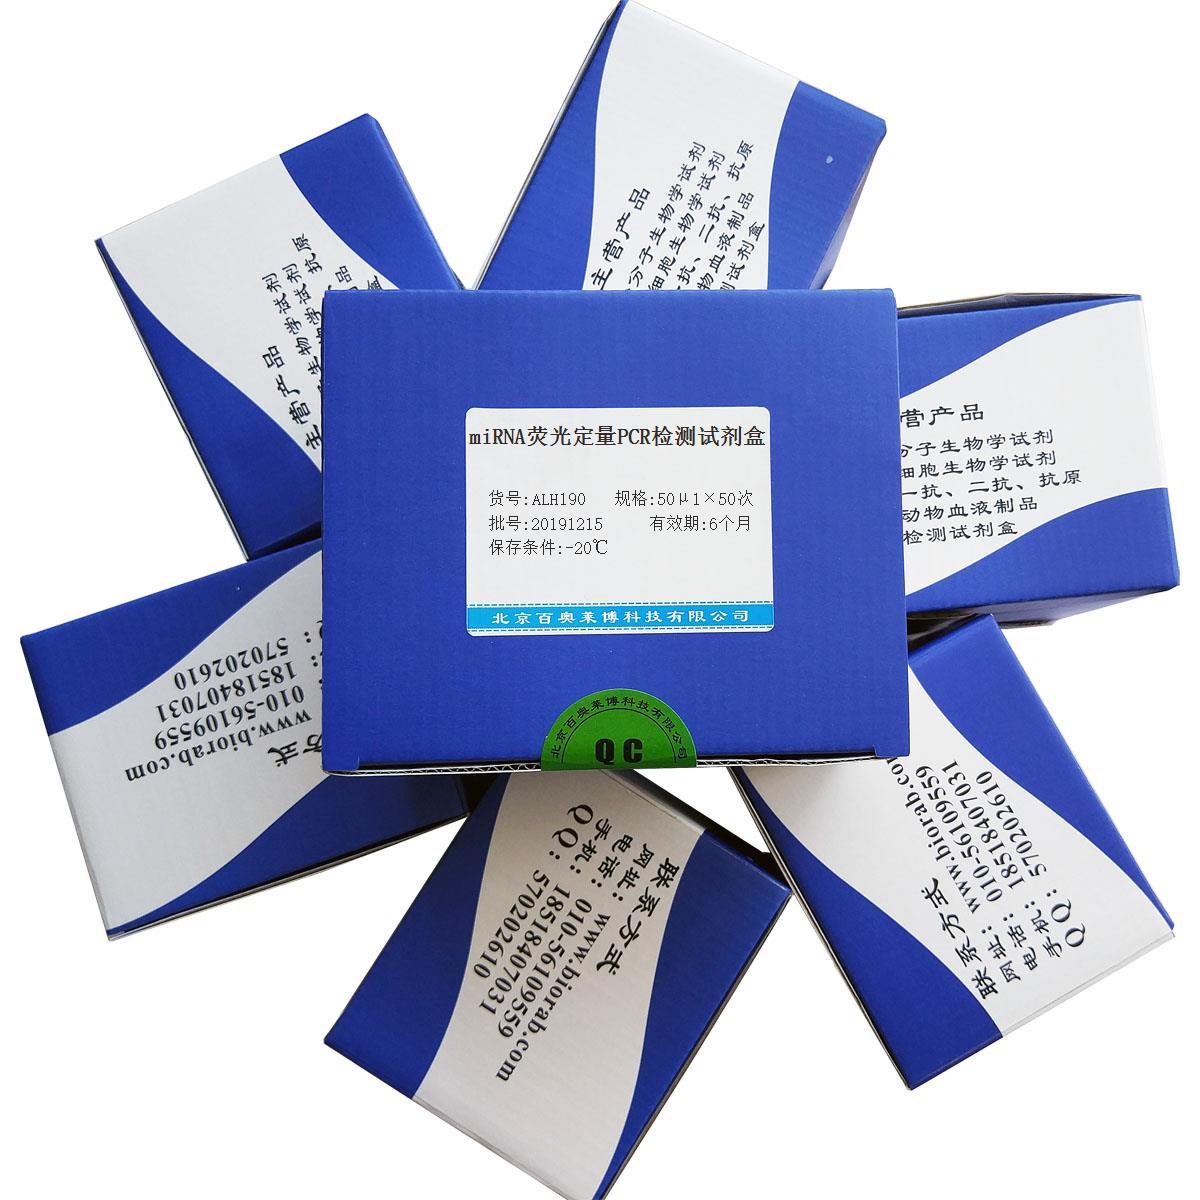 miRNA荧光定量PCR检测试剂盒北京品牌